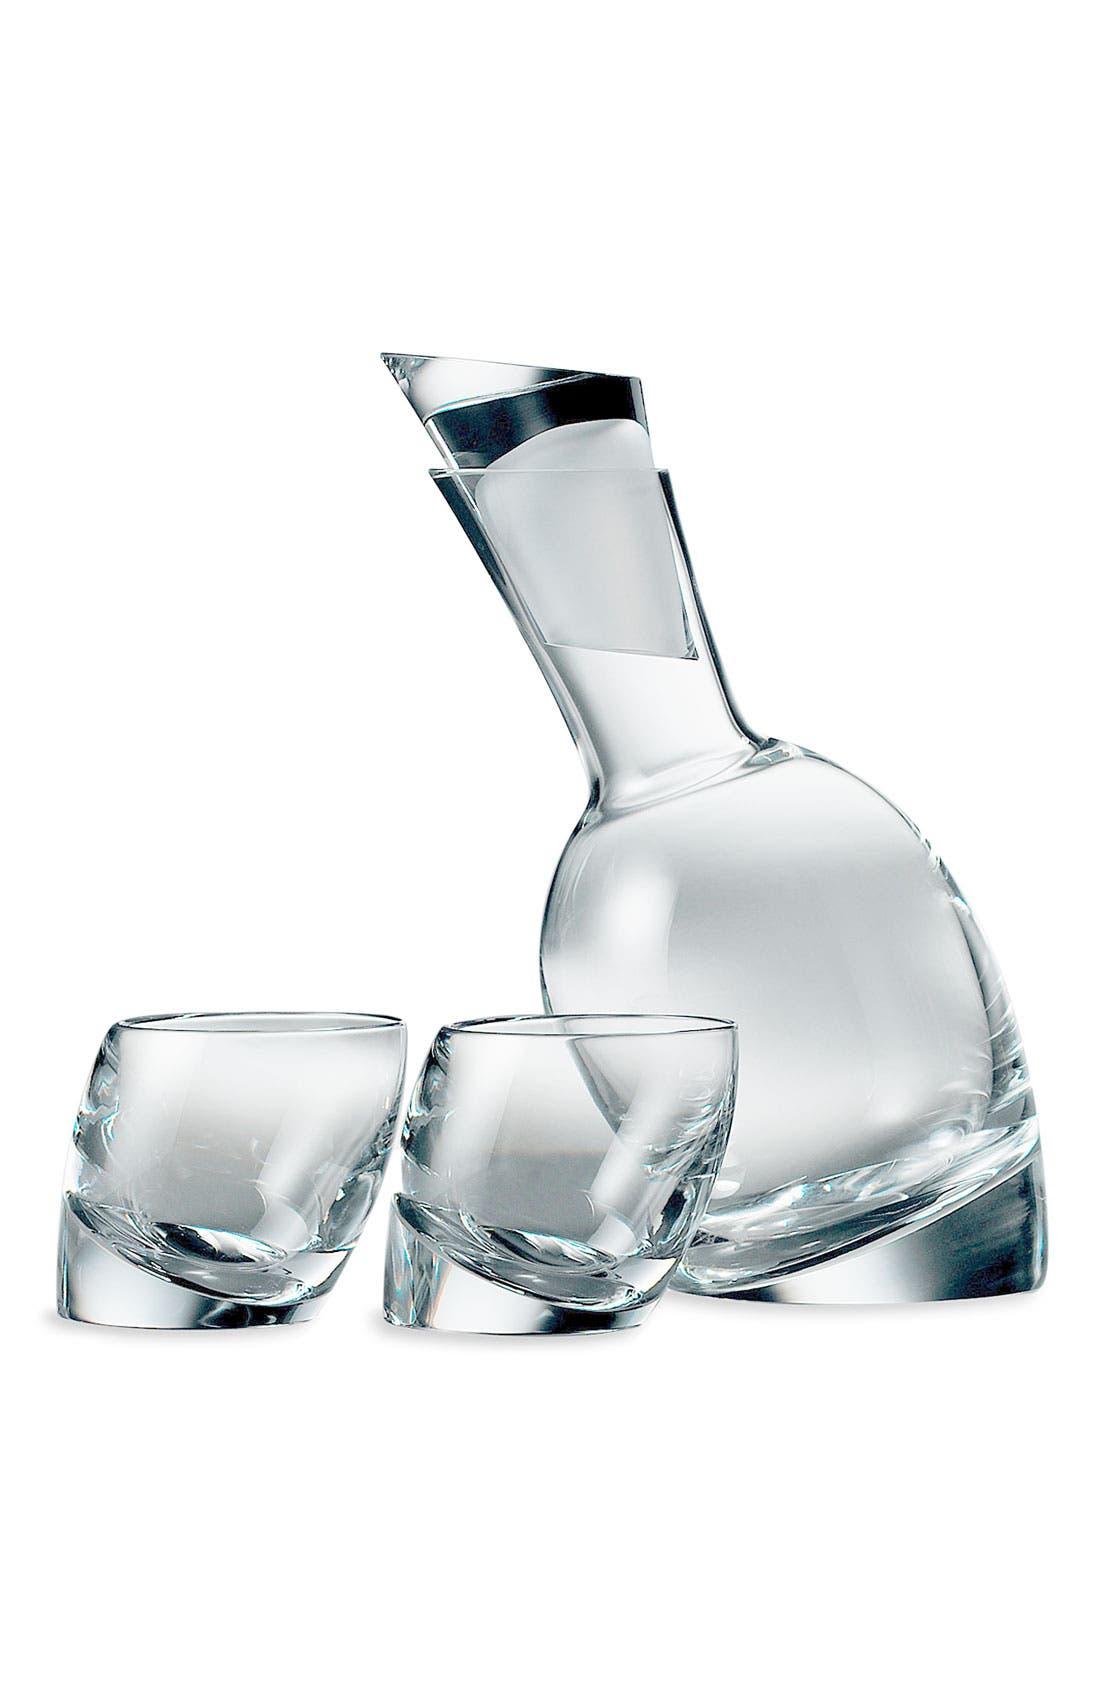 Alternate Image 1 Selected - Nambé 'Tilt' Decanter & Glasses Set